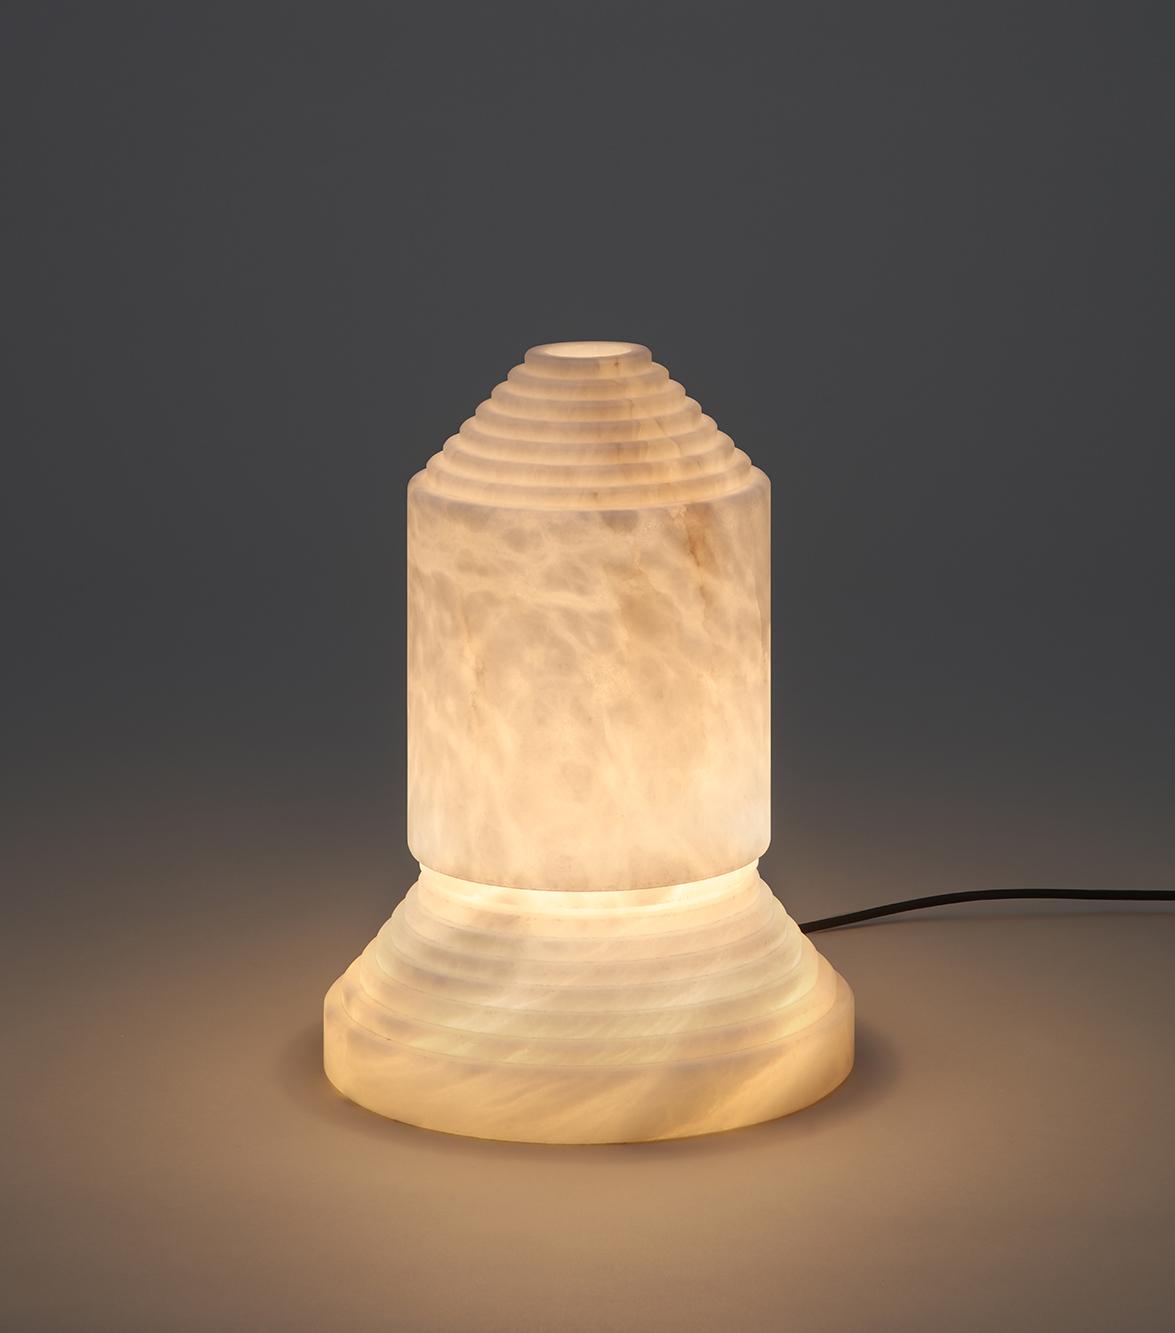 santacole_table_lamps_babel_arjalaguer__meri_1